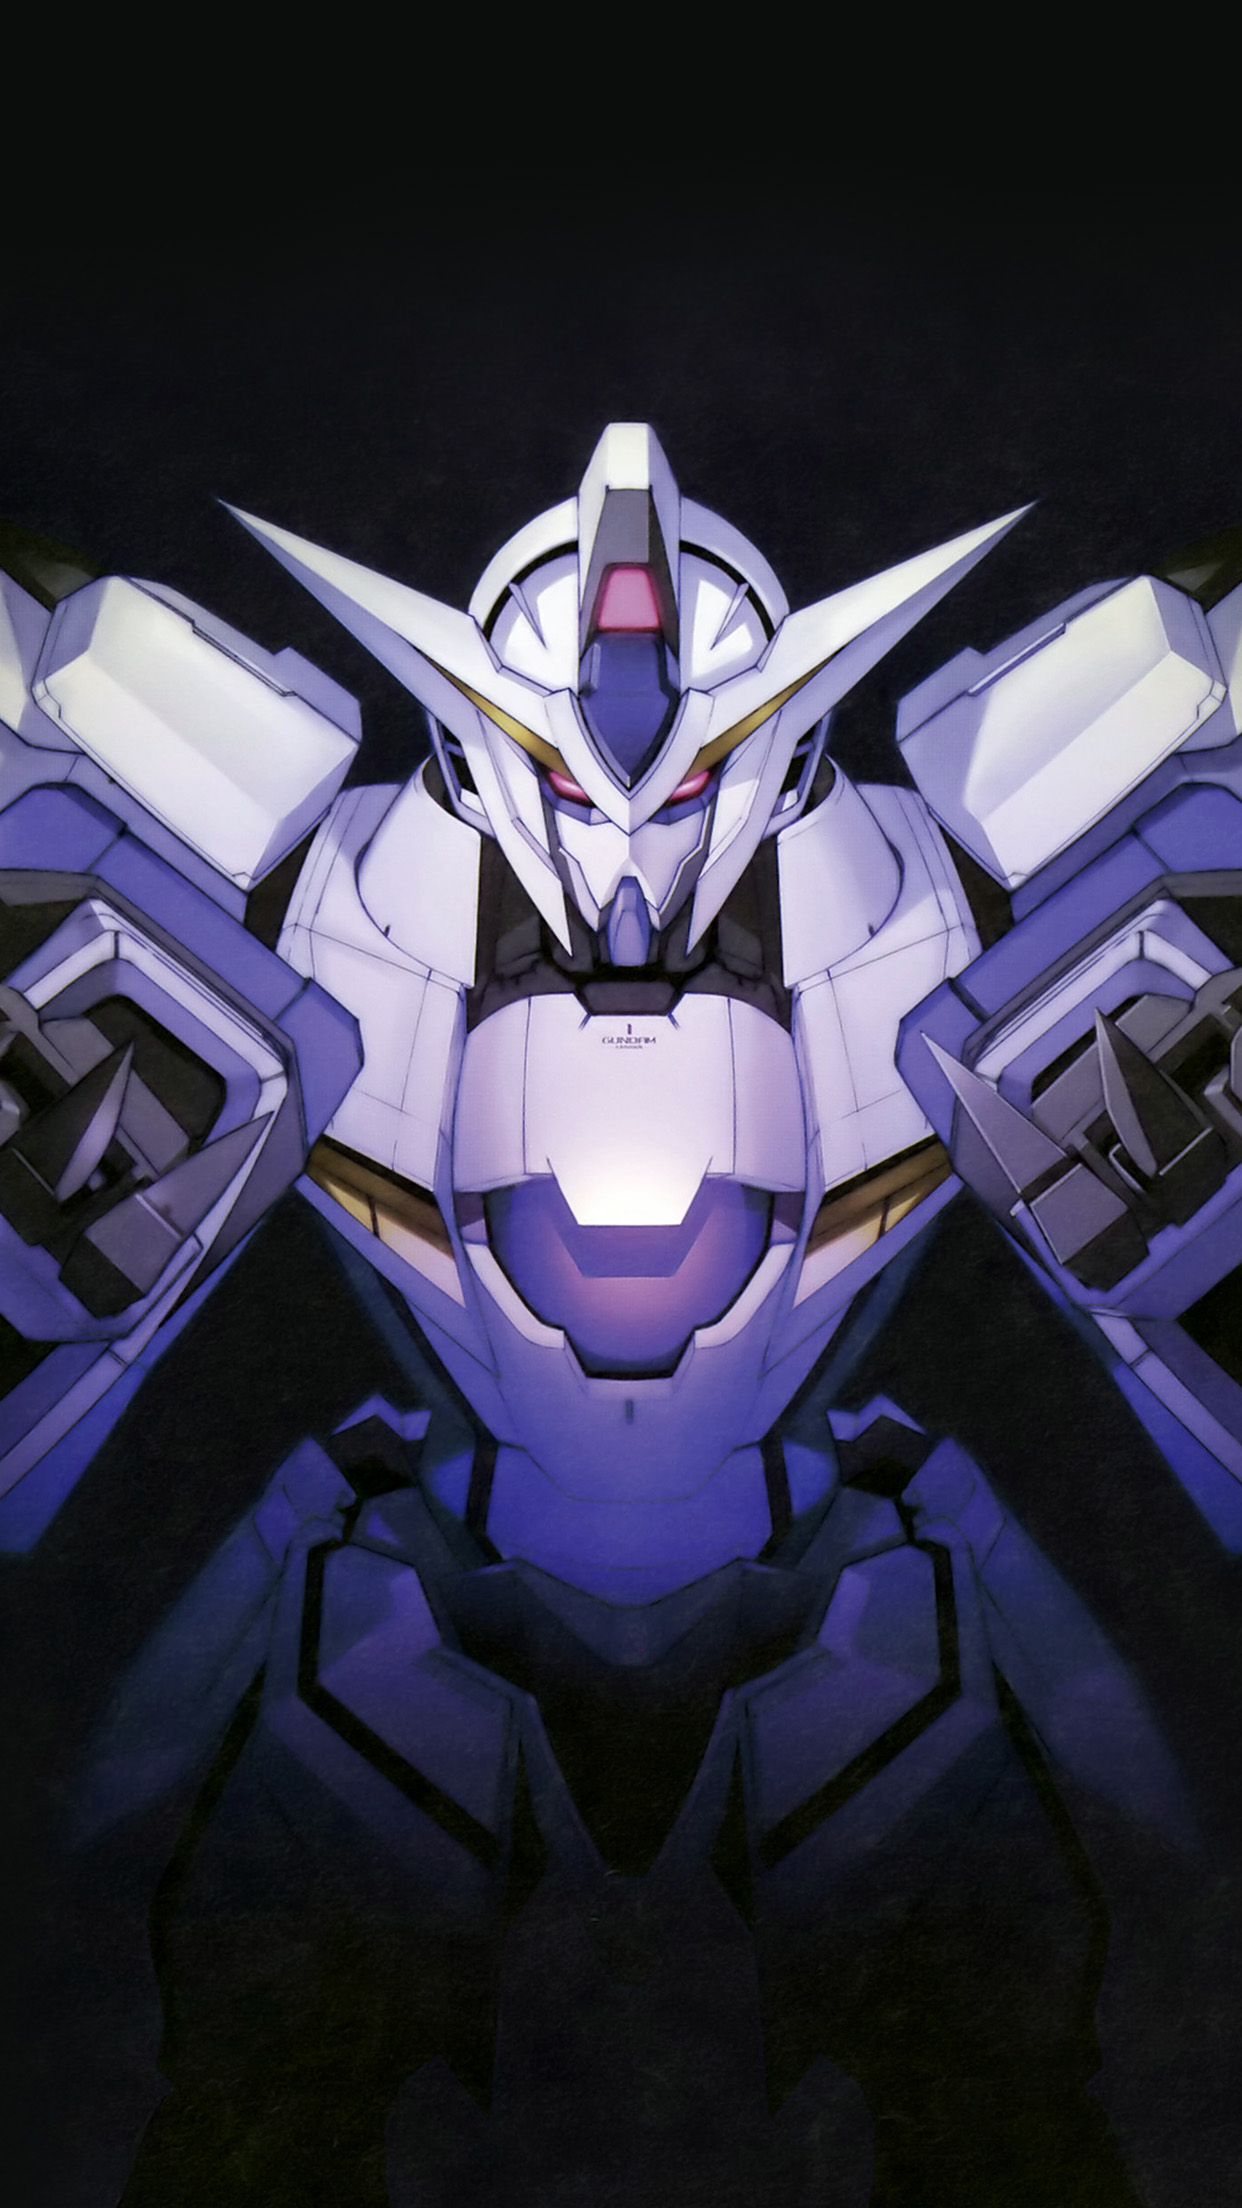 Gundam Art Dark Toy Game Illust Art Android Wallpaper Android Hd